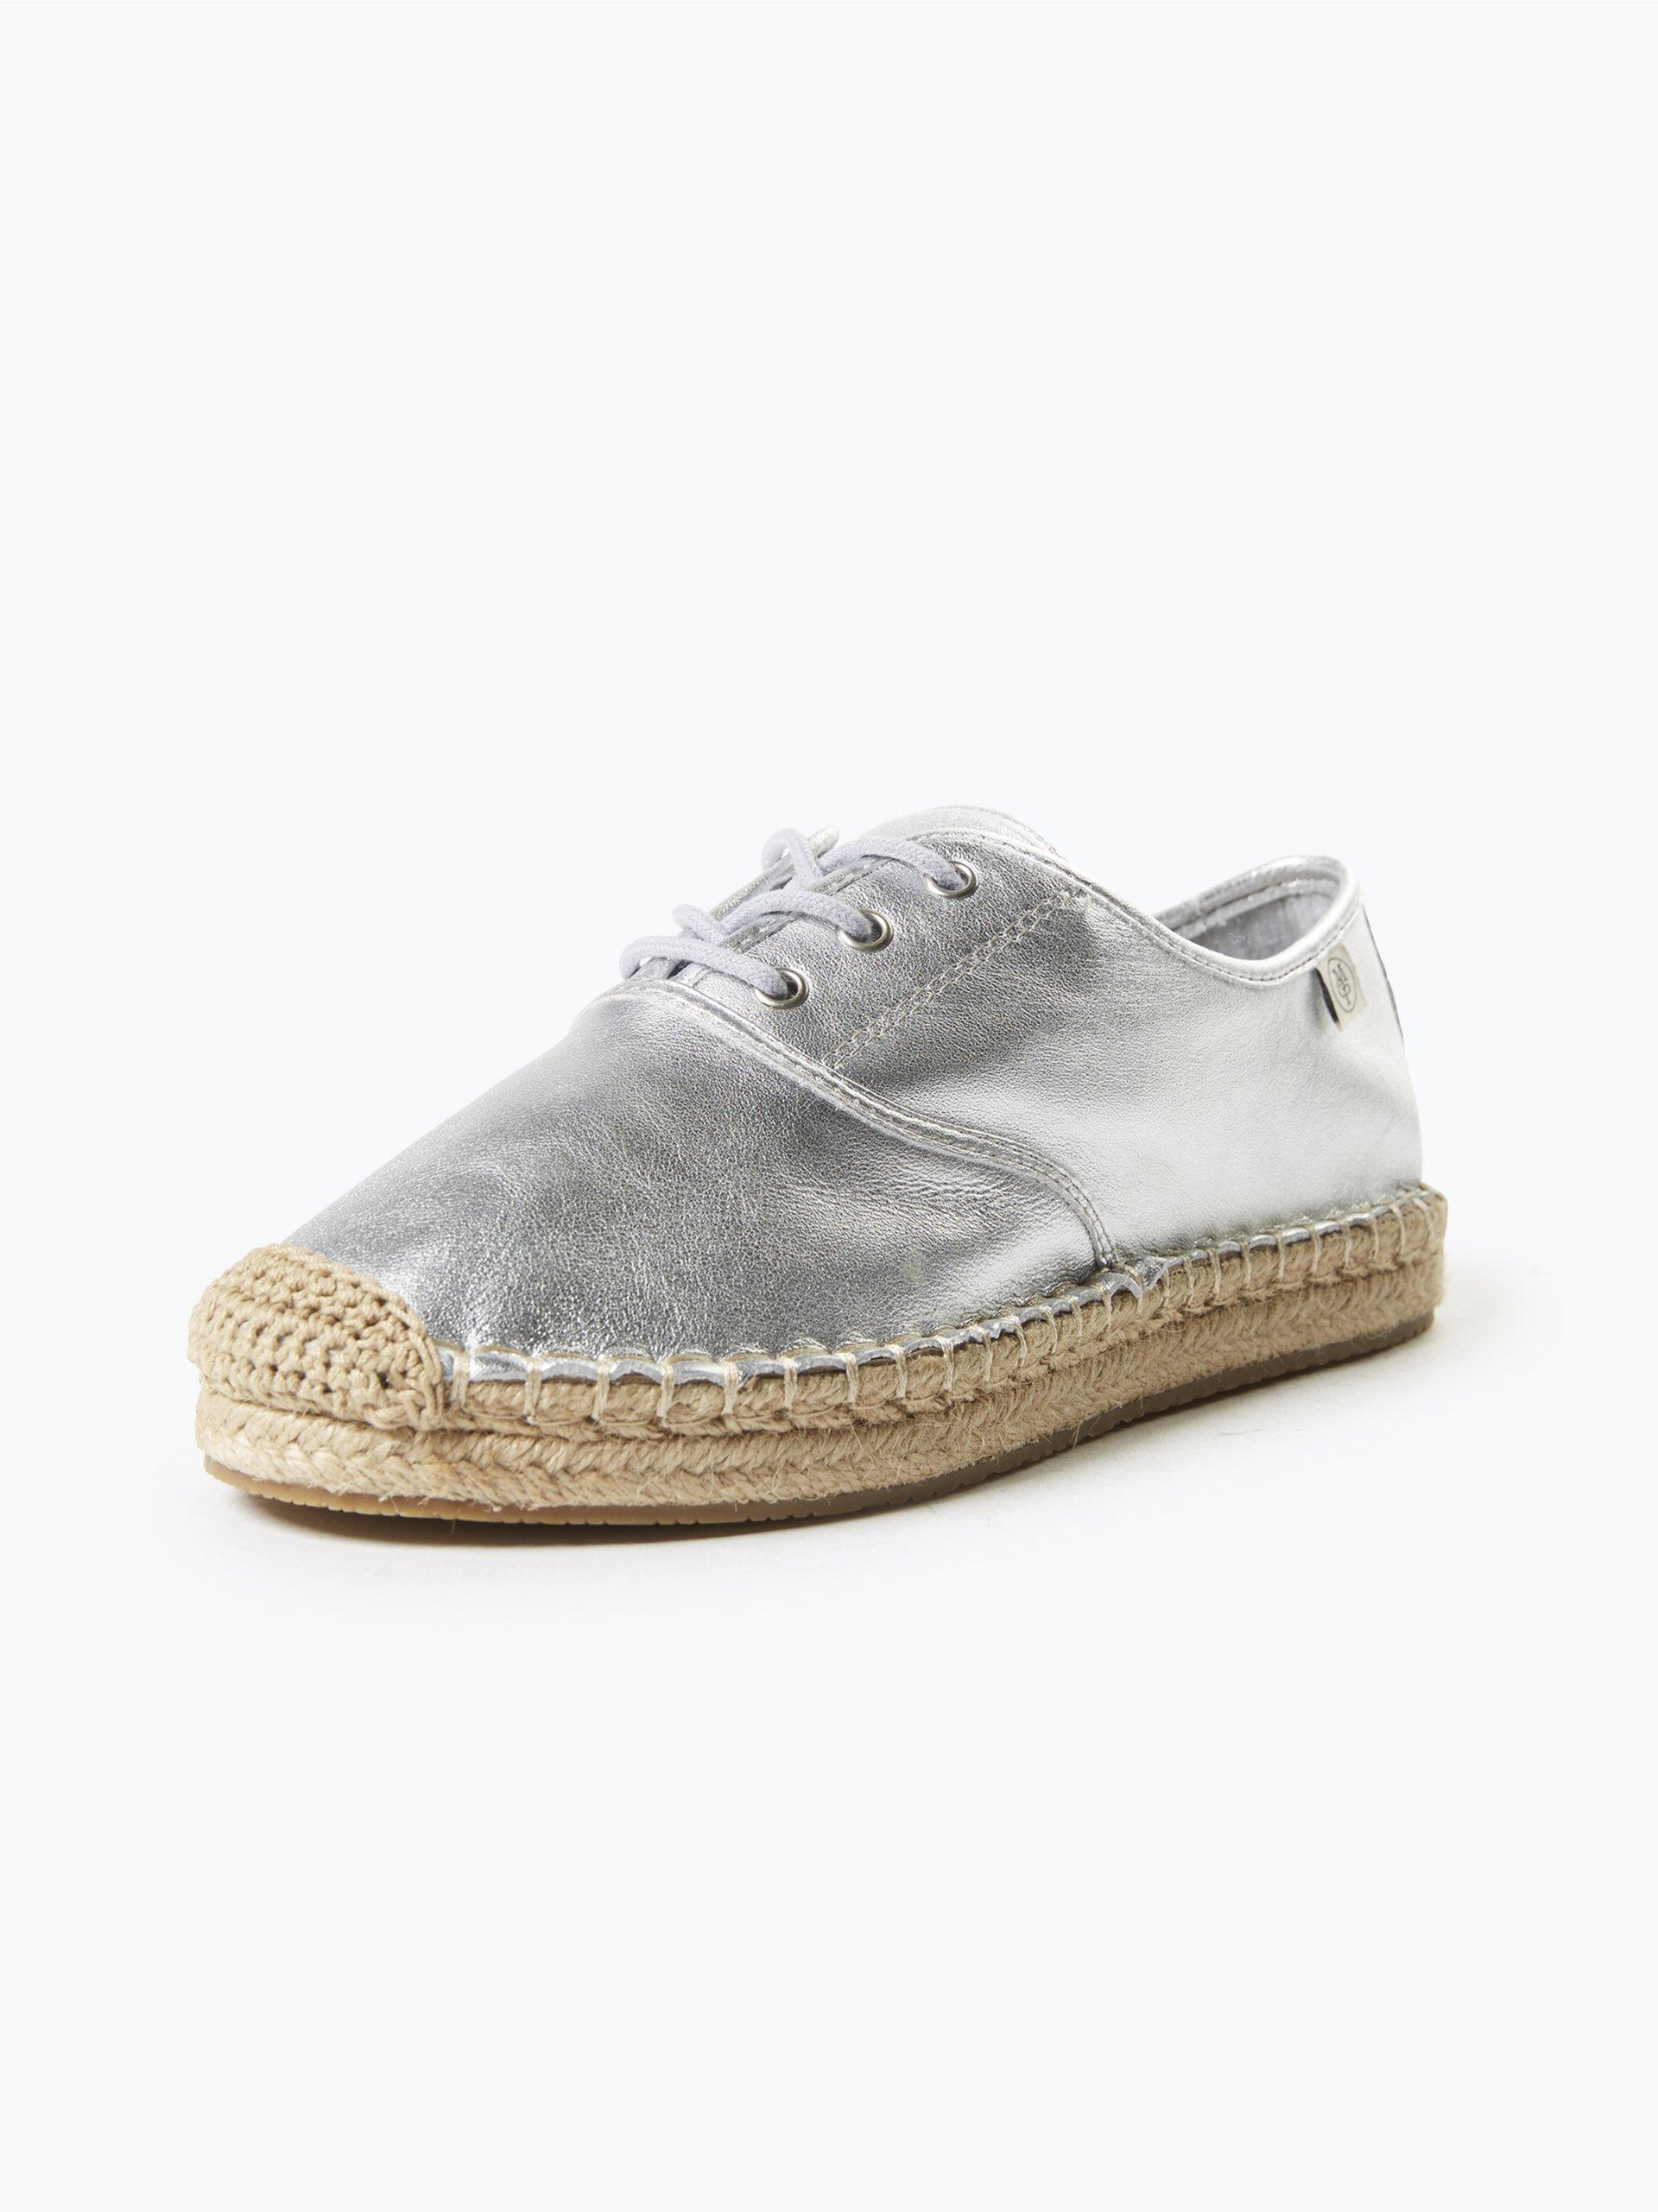 marc o 39 polo damen sneaker aus leder silber uni online kaufen peek und cloppenburg de. Black Bedroom Furniture Sets. Home Design Ideas